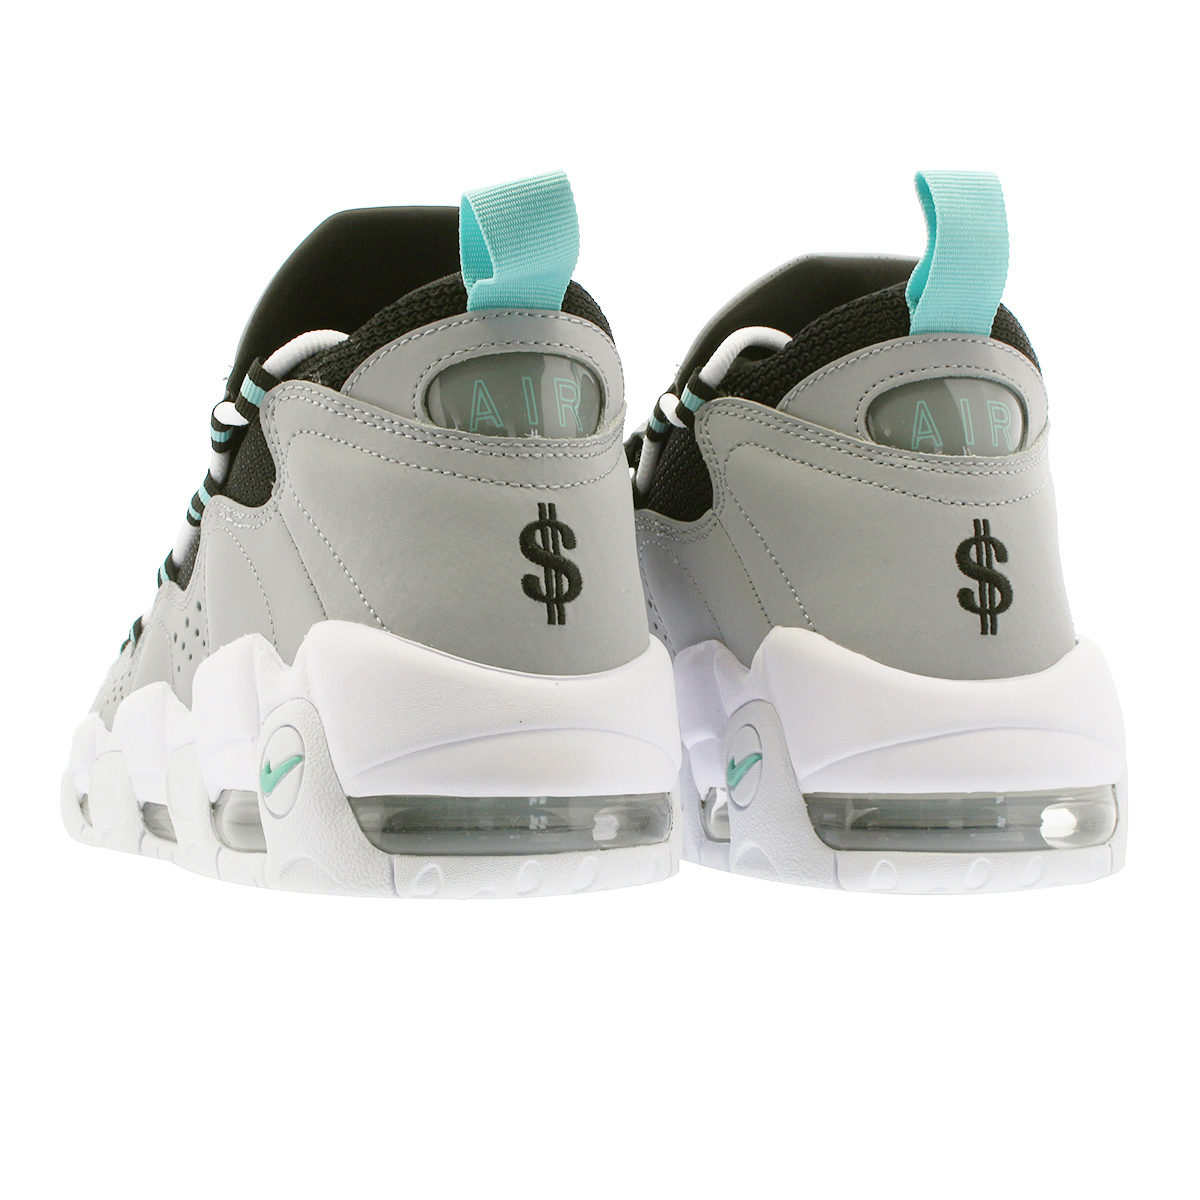 hot sale online ca84f 823b9 NIKE AIR MORE MONEY Nike air more money WOLF GREY ISLAND GREEN BLACK aj2998- 003